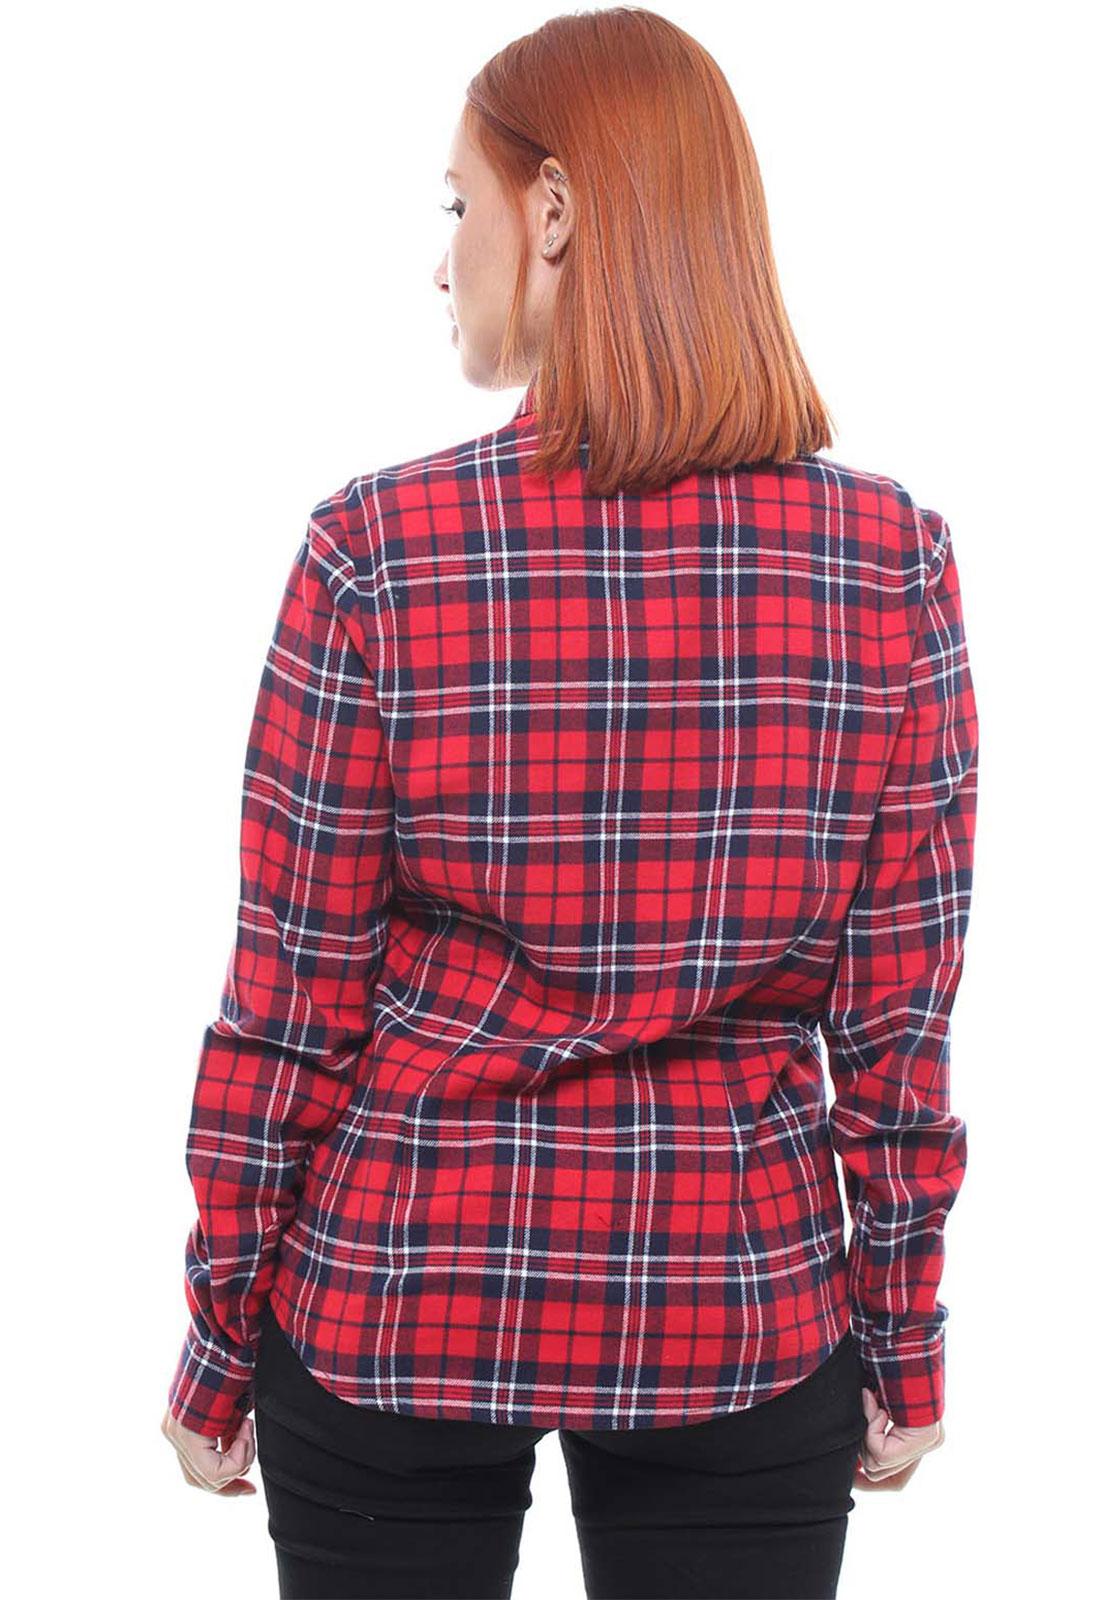 Camisa Feminina Xadrez Flanelada Crocker - 47345  - CROCKER JEANS